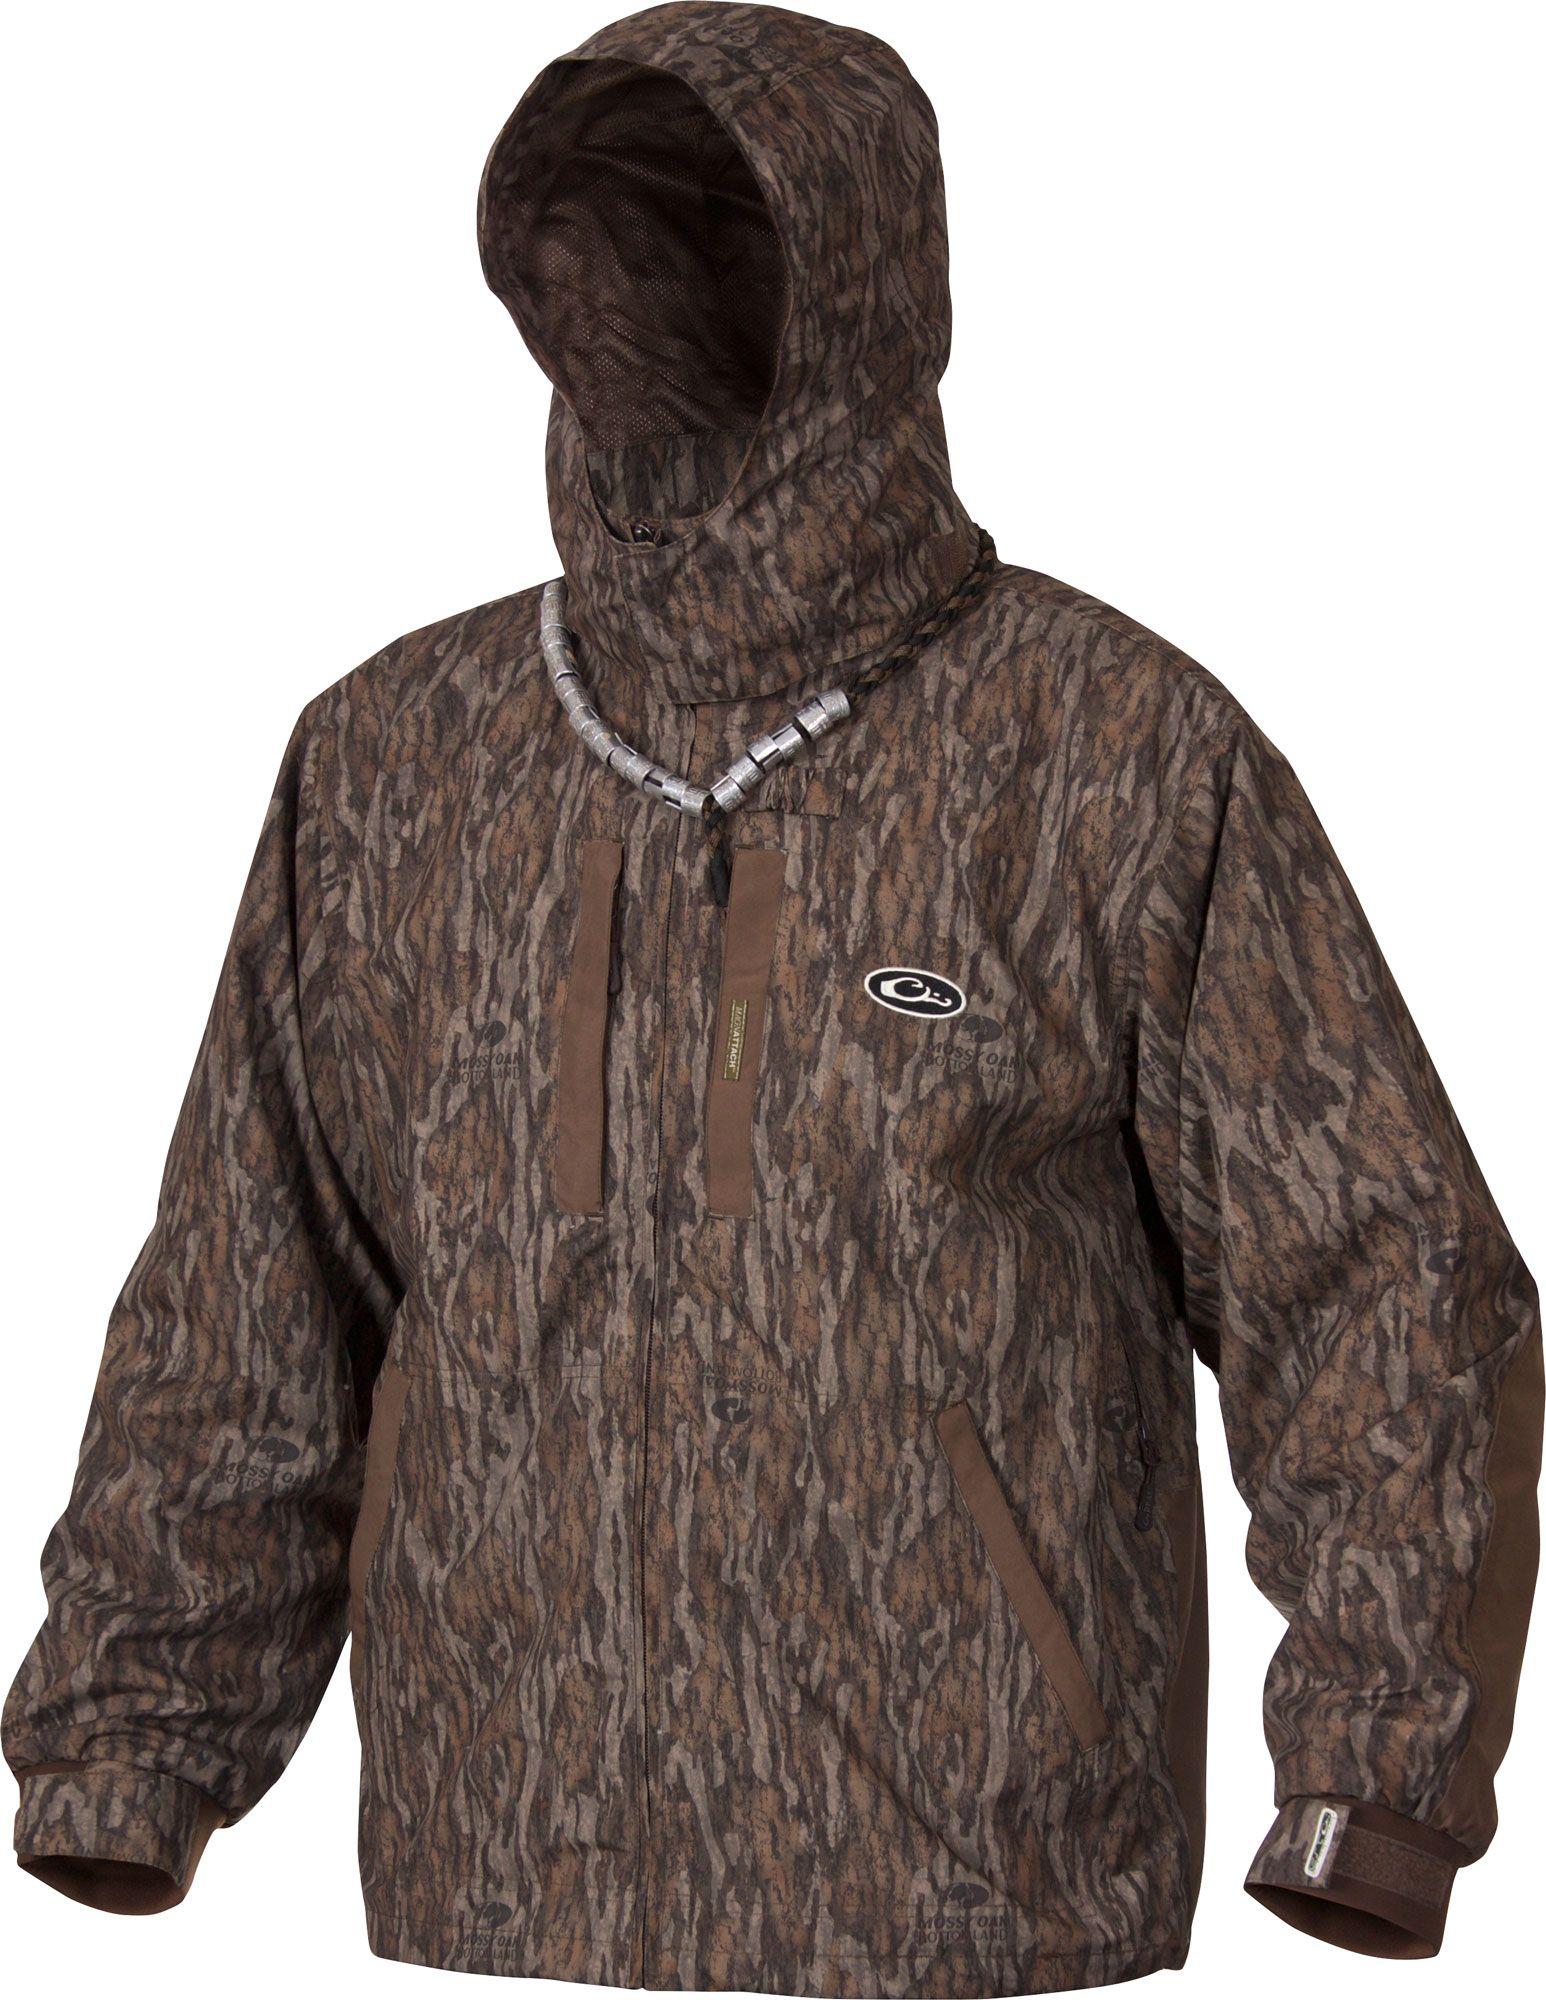 Drake Waterfowl EST Heat-Escape Full Zip Jacket, Men's, XL, Brown